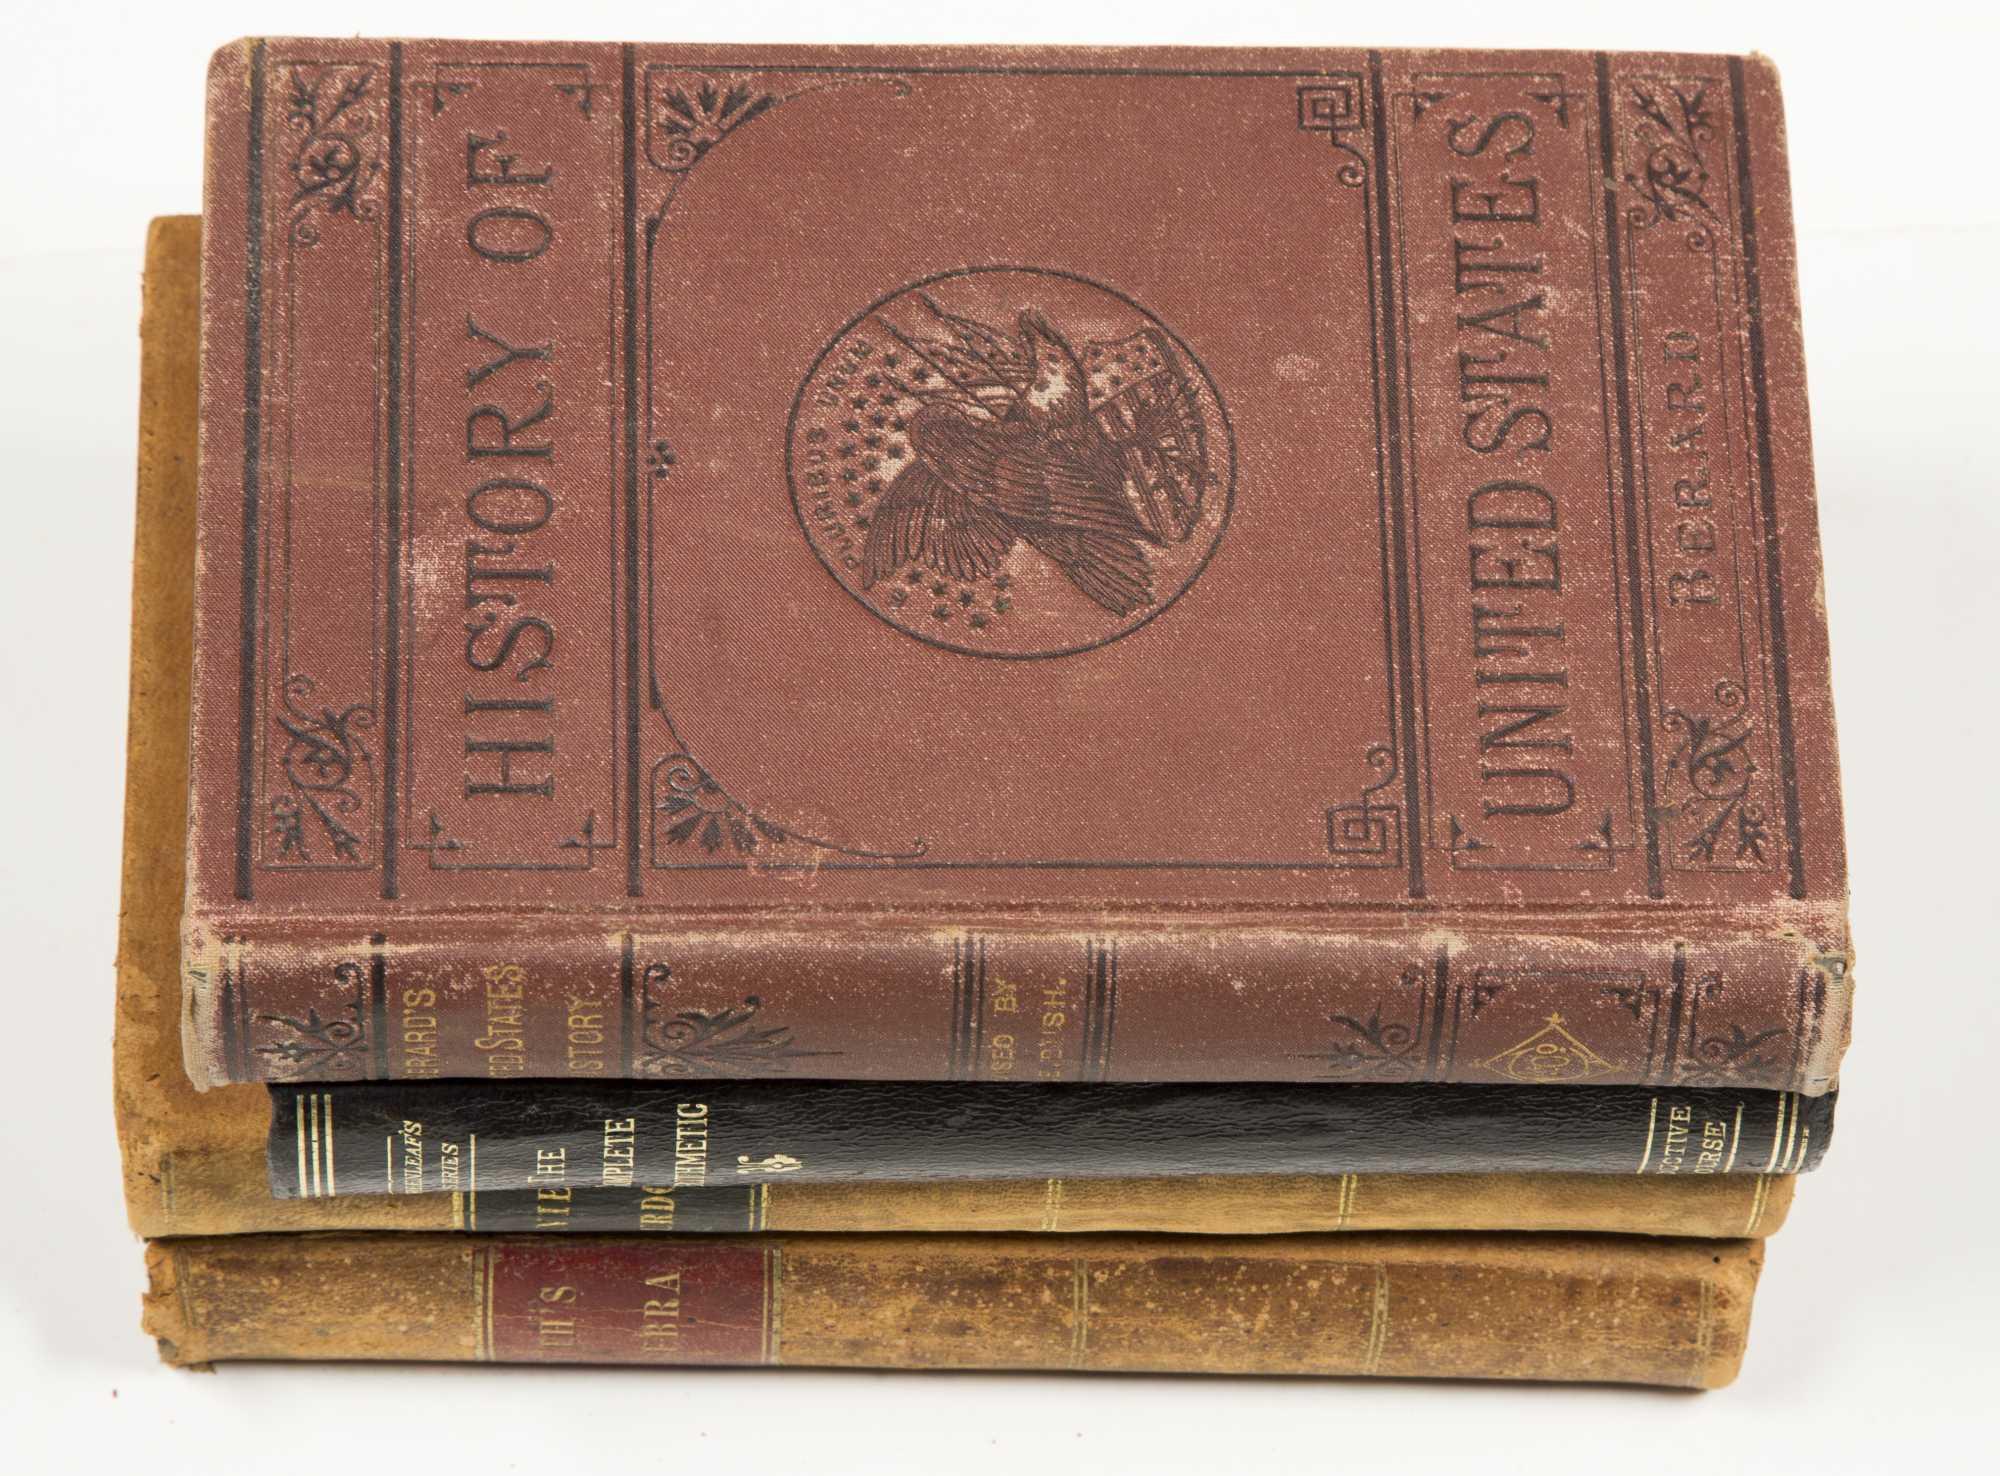 19th Century School Books 10 Titles